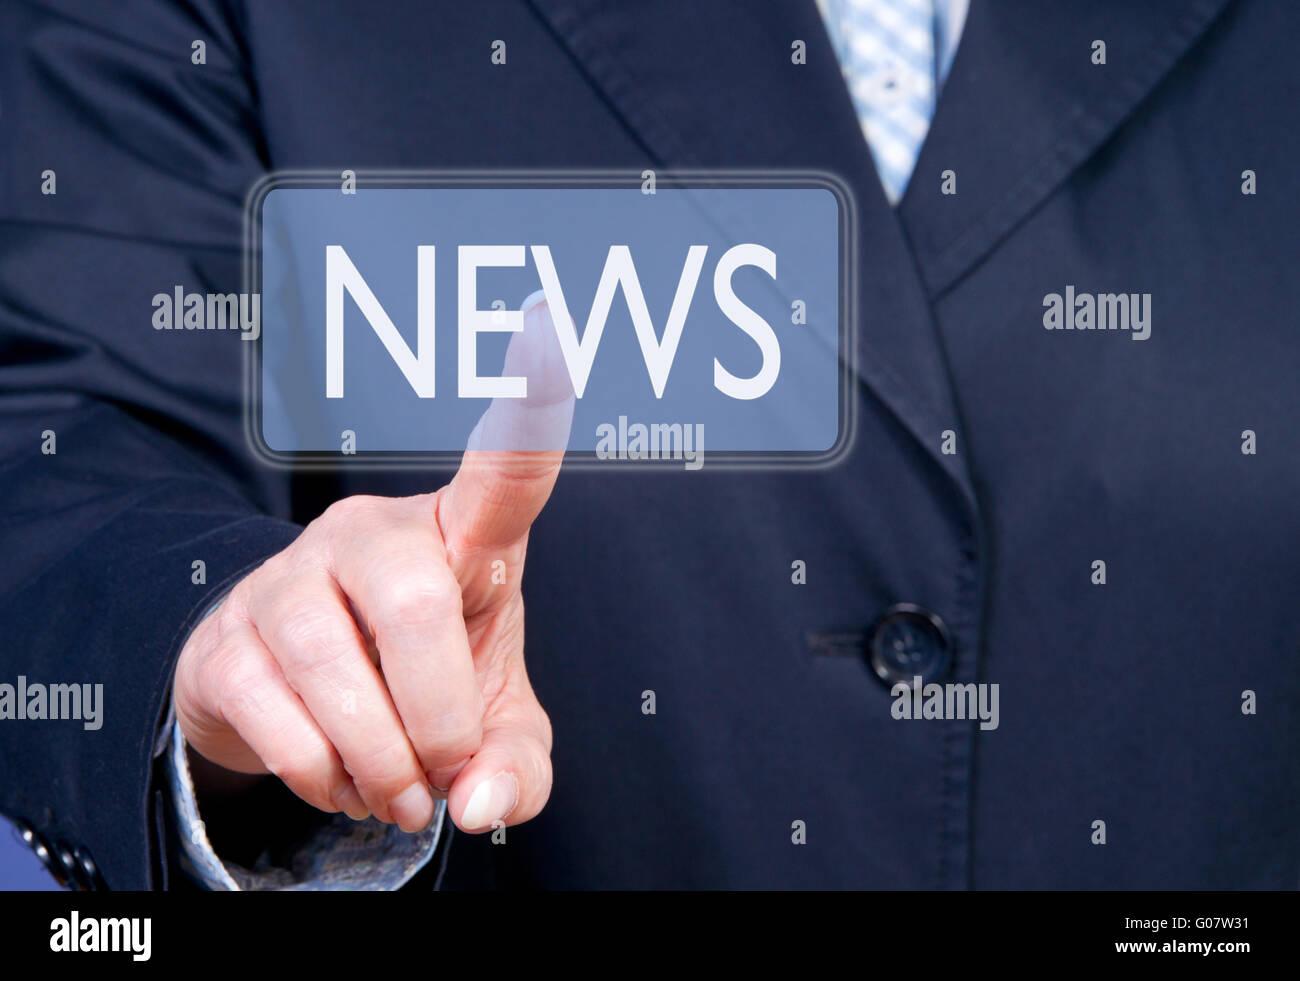 NEWS - Stock Image